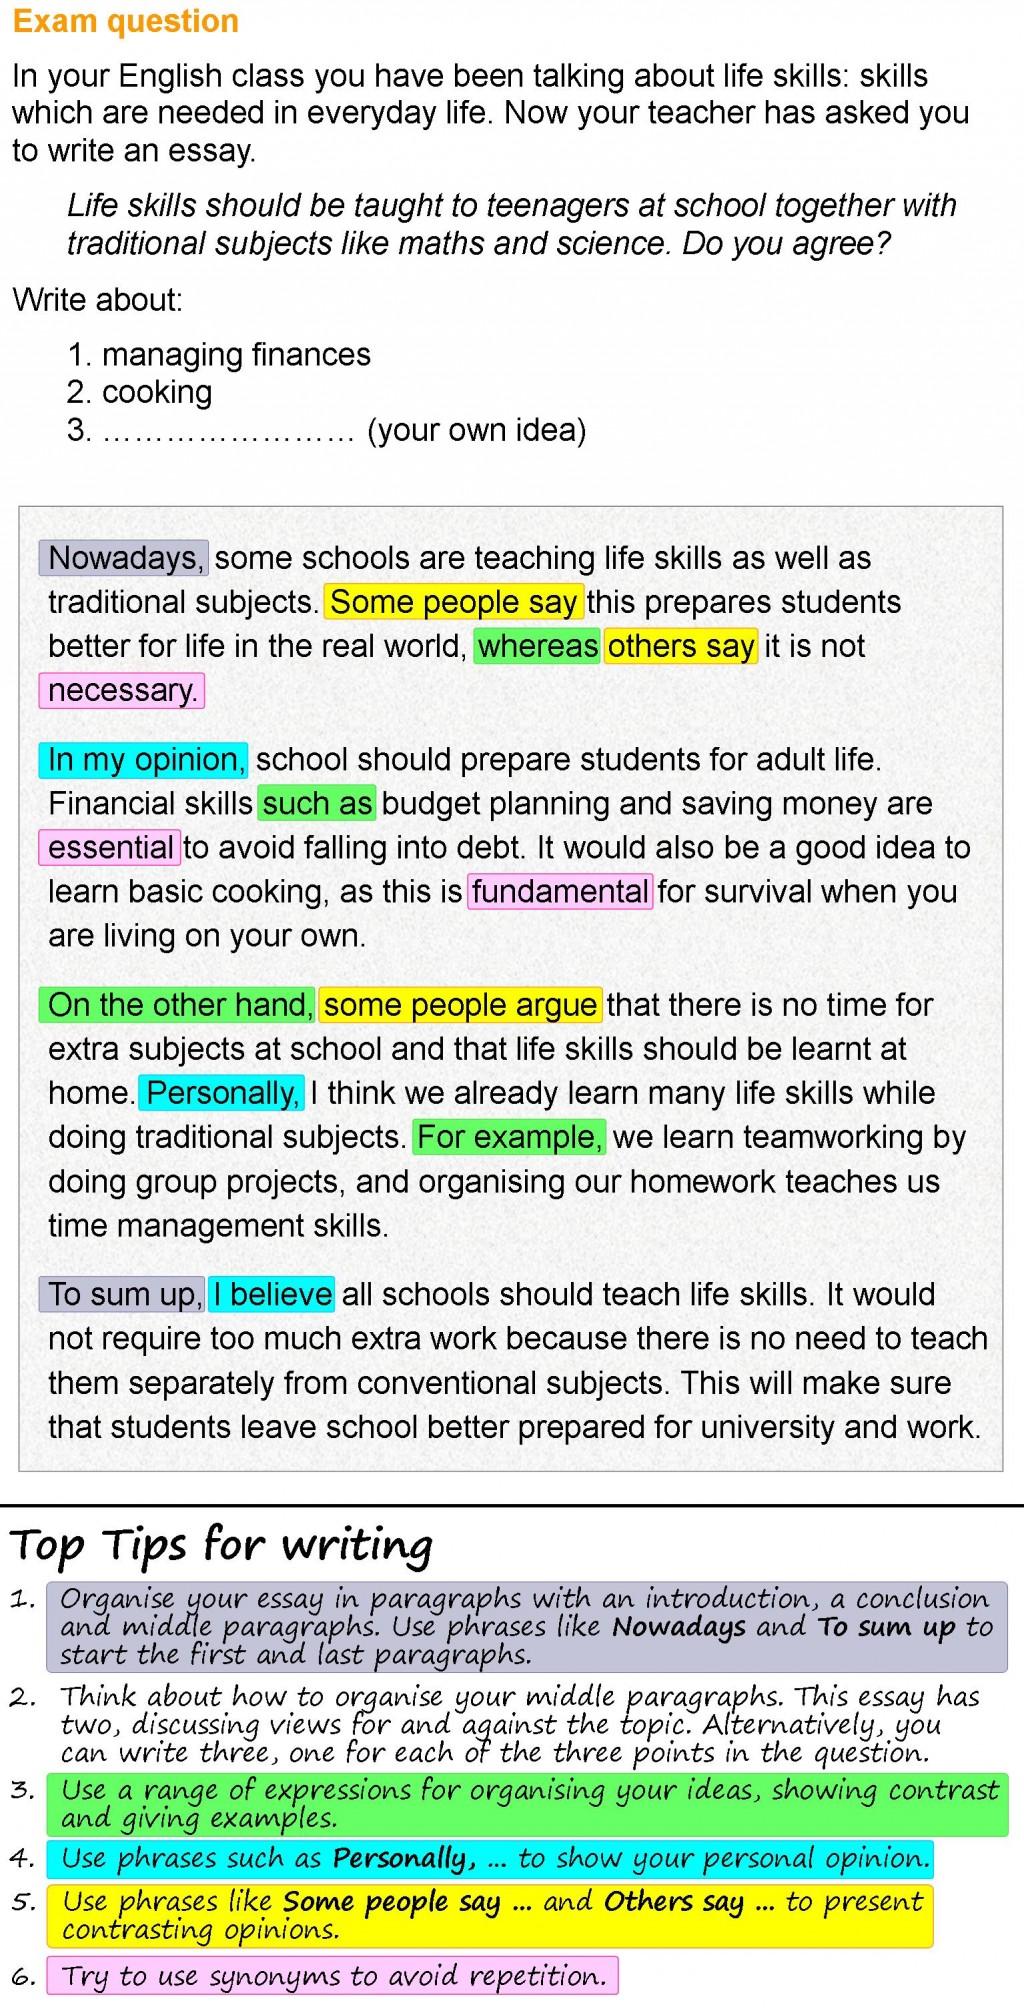 006 Essay Writing On Examination Day Life Skills 1 Rare Large